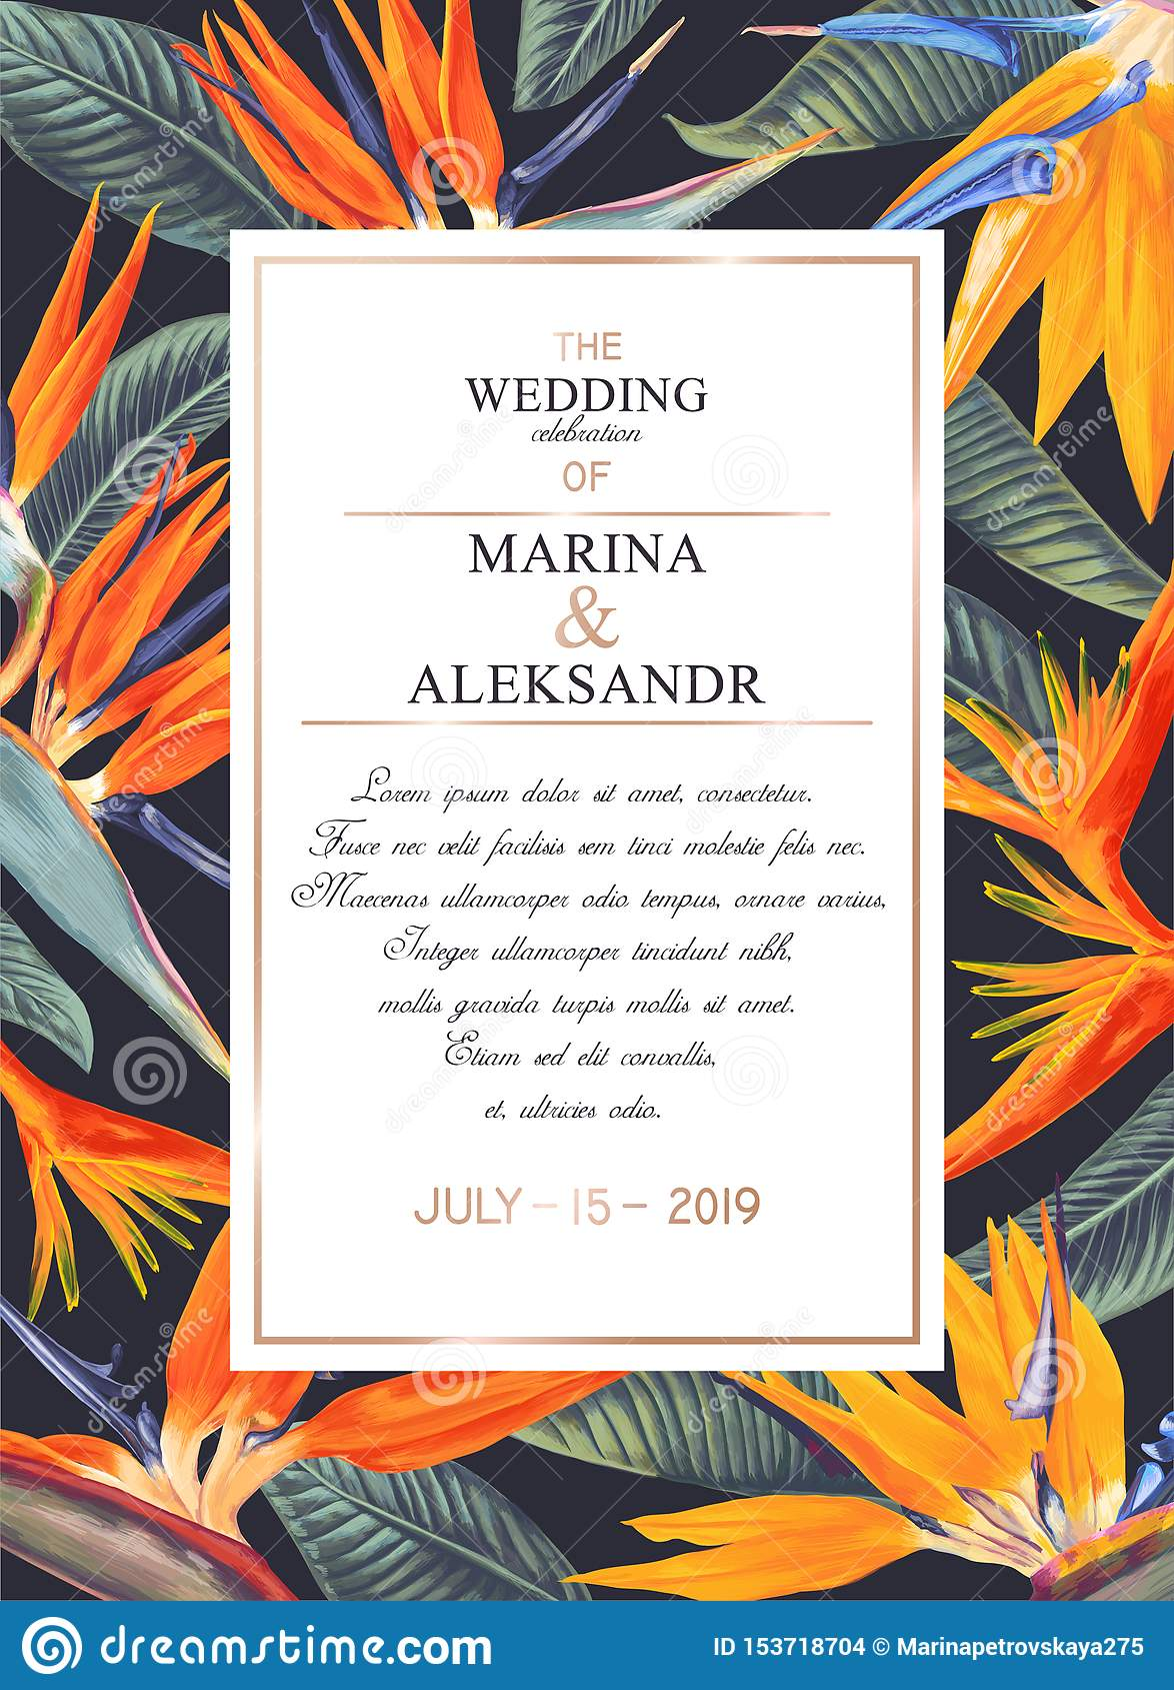 Botanical Wedding Invitation Card Template Design With